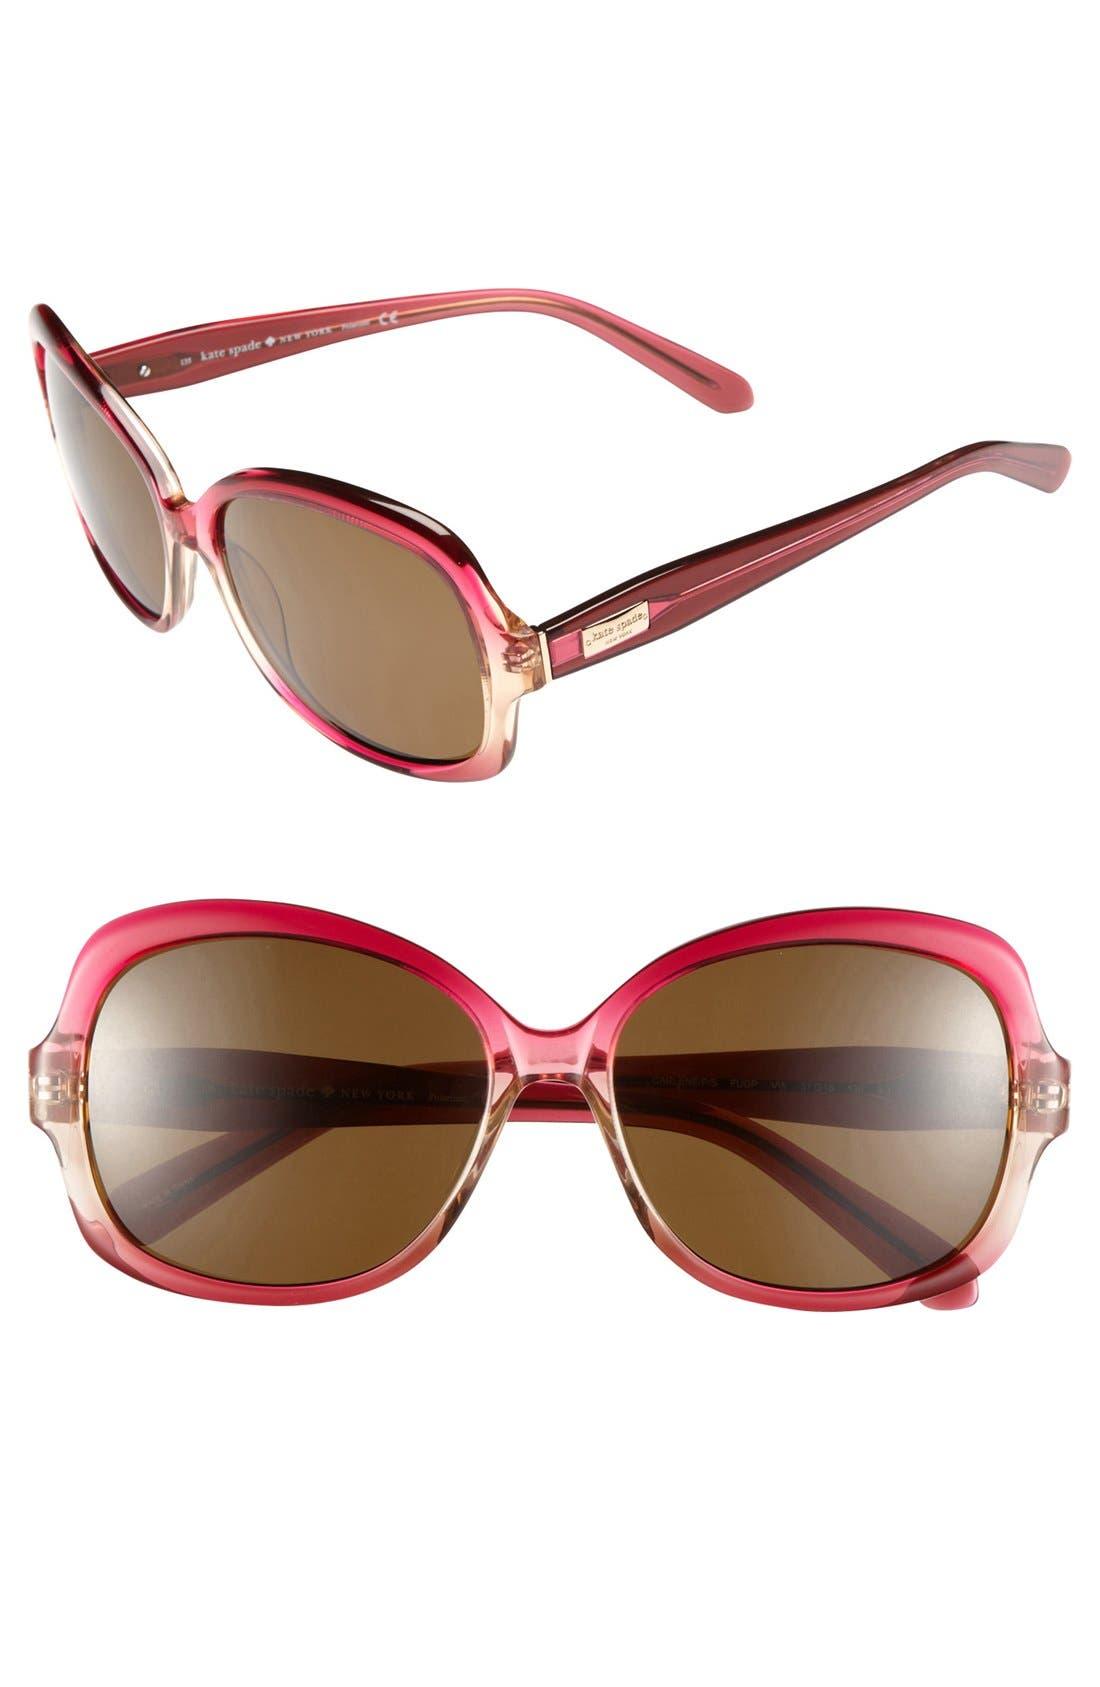 Alternate Image 1 Selected - kate spade new york 'carlene' 57mm polarized sunglasses